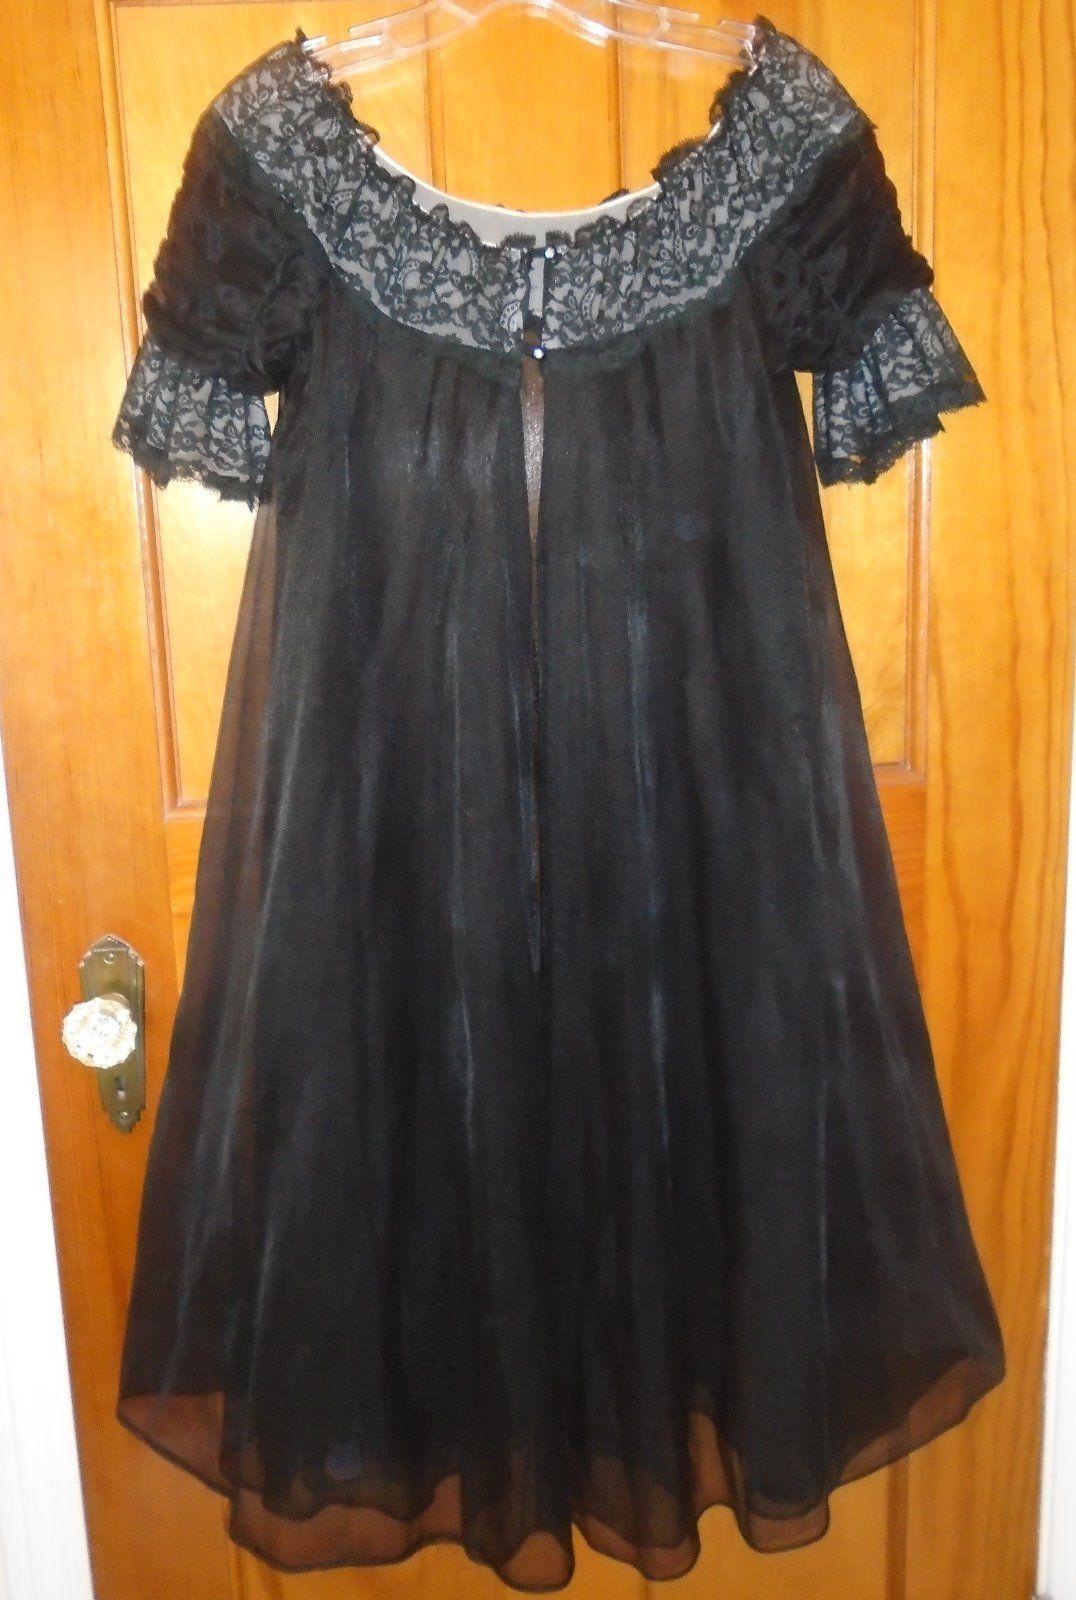 Vintage 50s Black Nylon Chiffon Lace Peignoir Nightgown